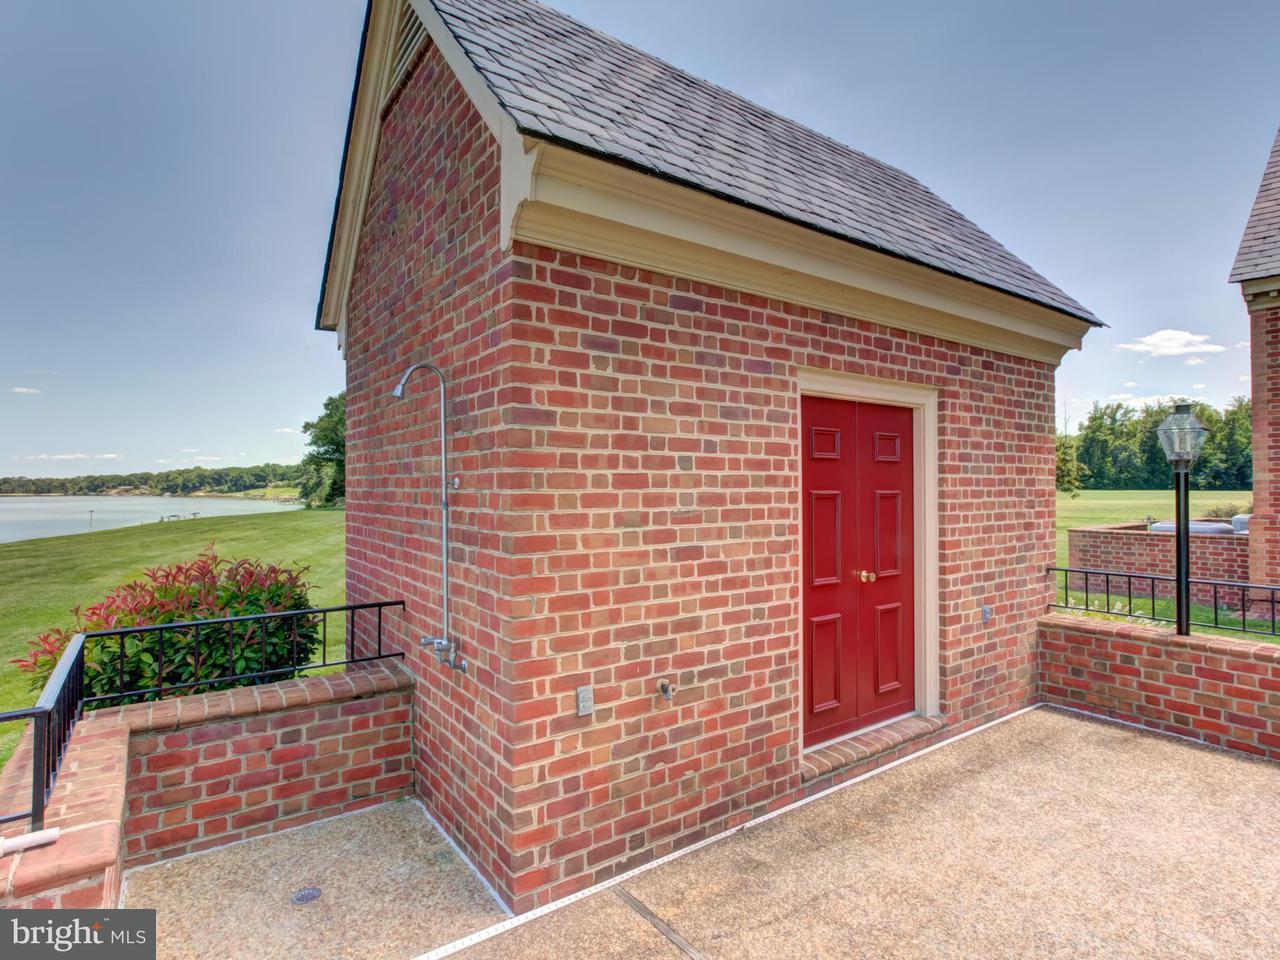 Additional photo for property listing at 16207 Tidewater Trail 16207 Tidewater Trail Tappahannock, Virginia 22560 Stati Uniti